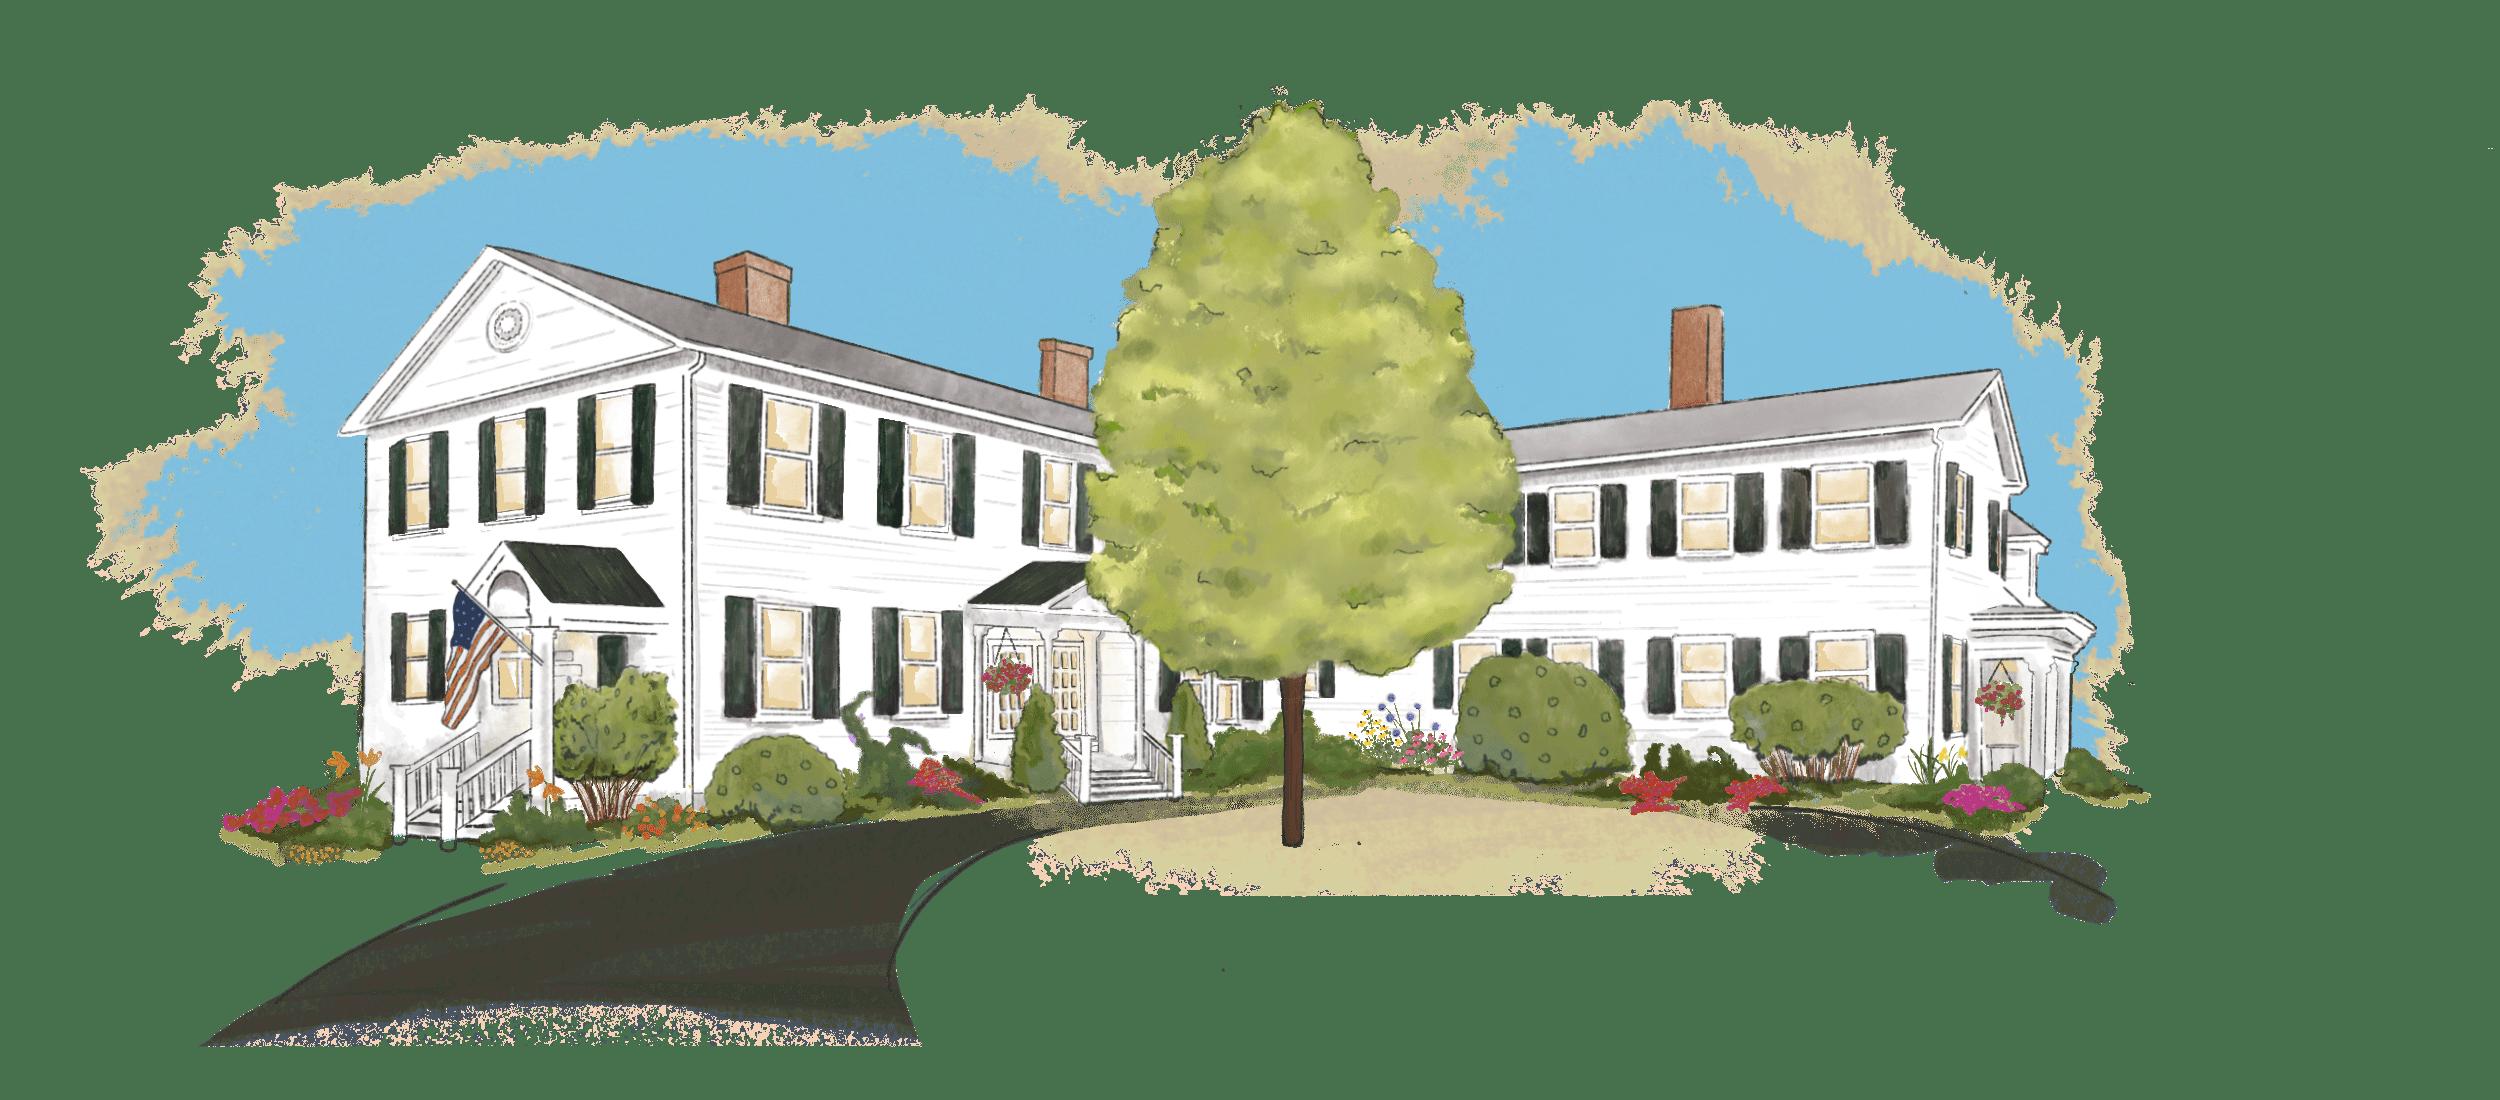 illustration of Swift House Inn main building in the Summer season